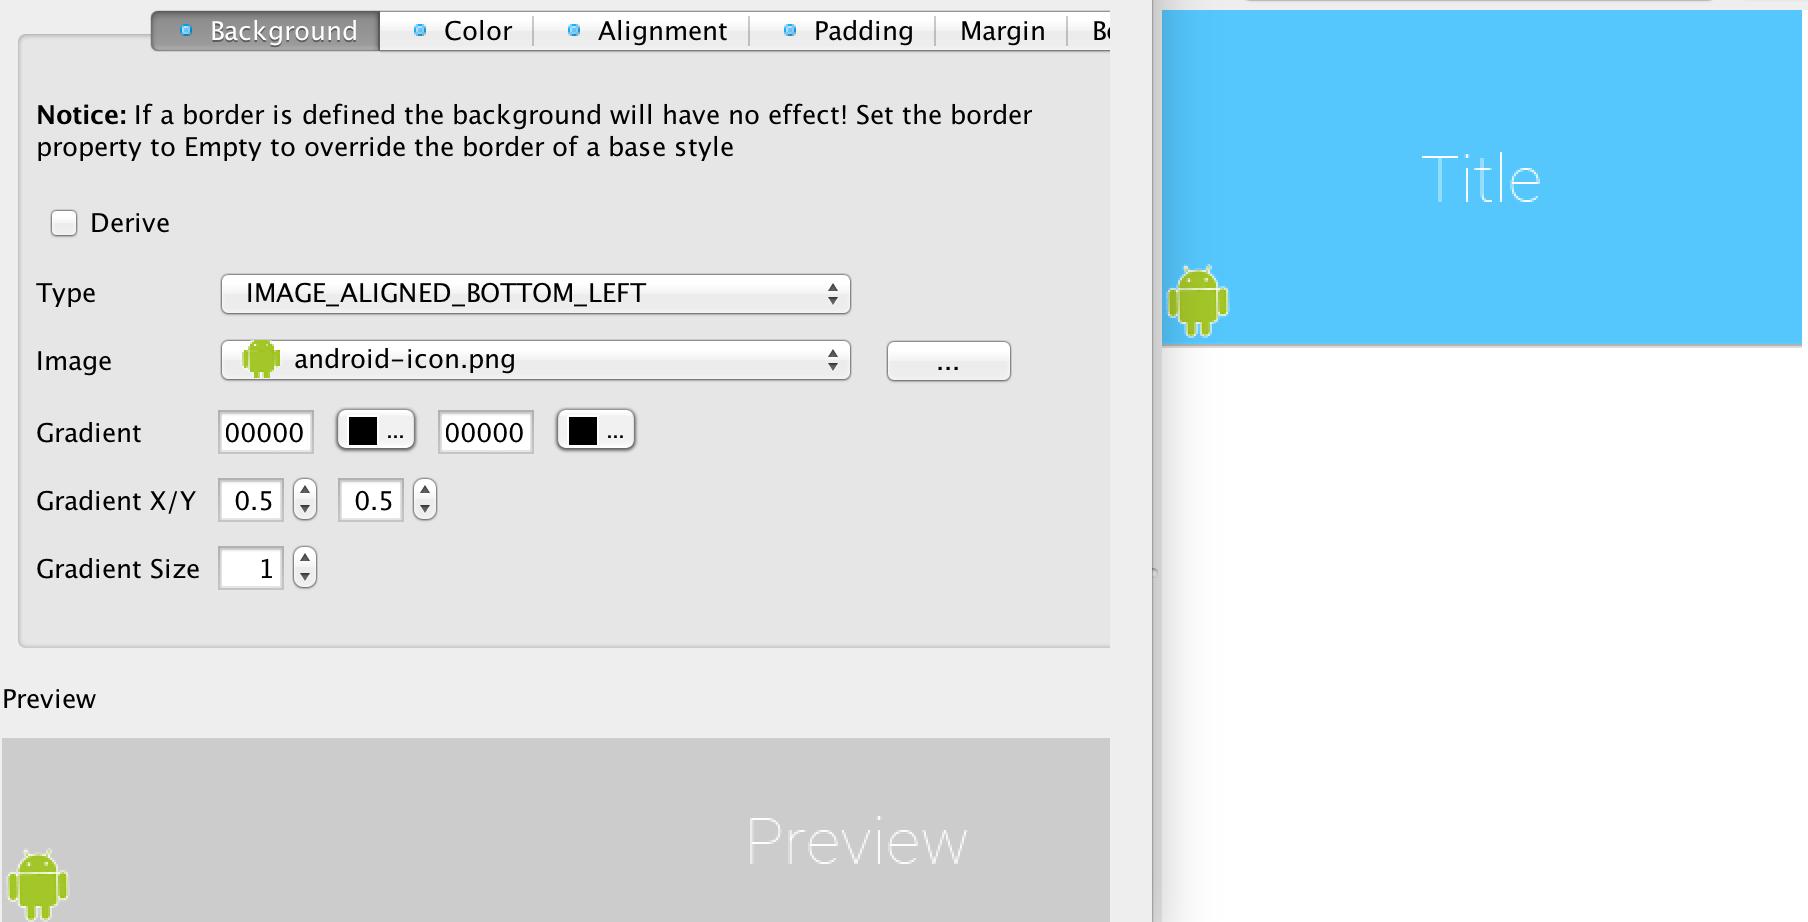 Background image bottom 0 - Image_aligned_bottom_left Places The Image At The Bottom Left Corner